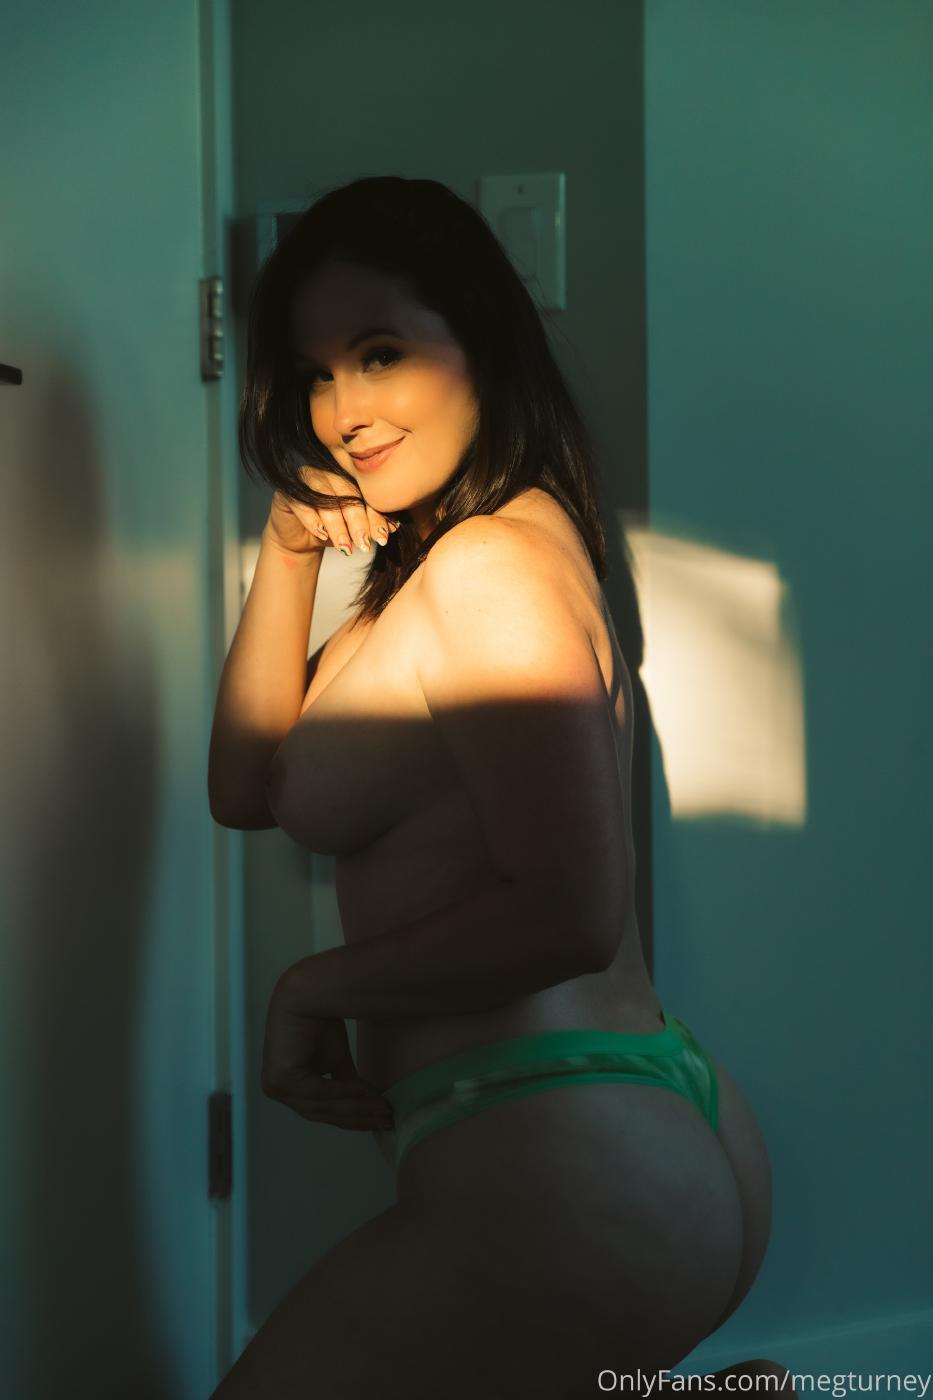 Meg Turney Nude Sunset Onlyfans Set Leaked Sbgdam